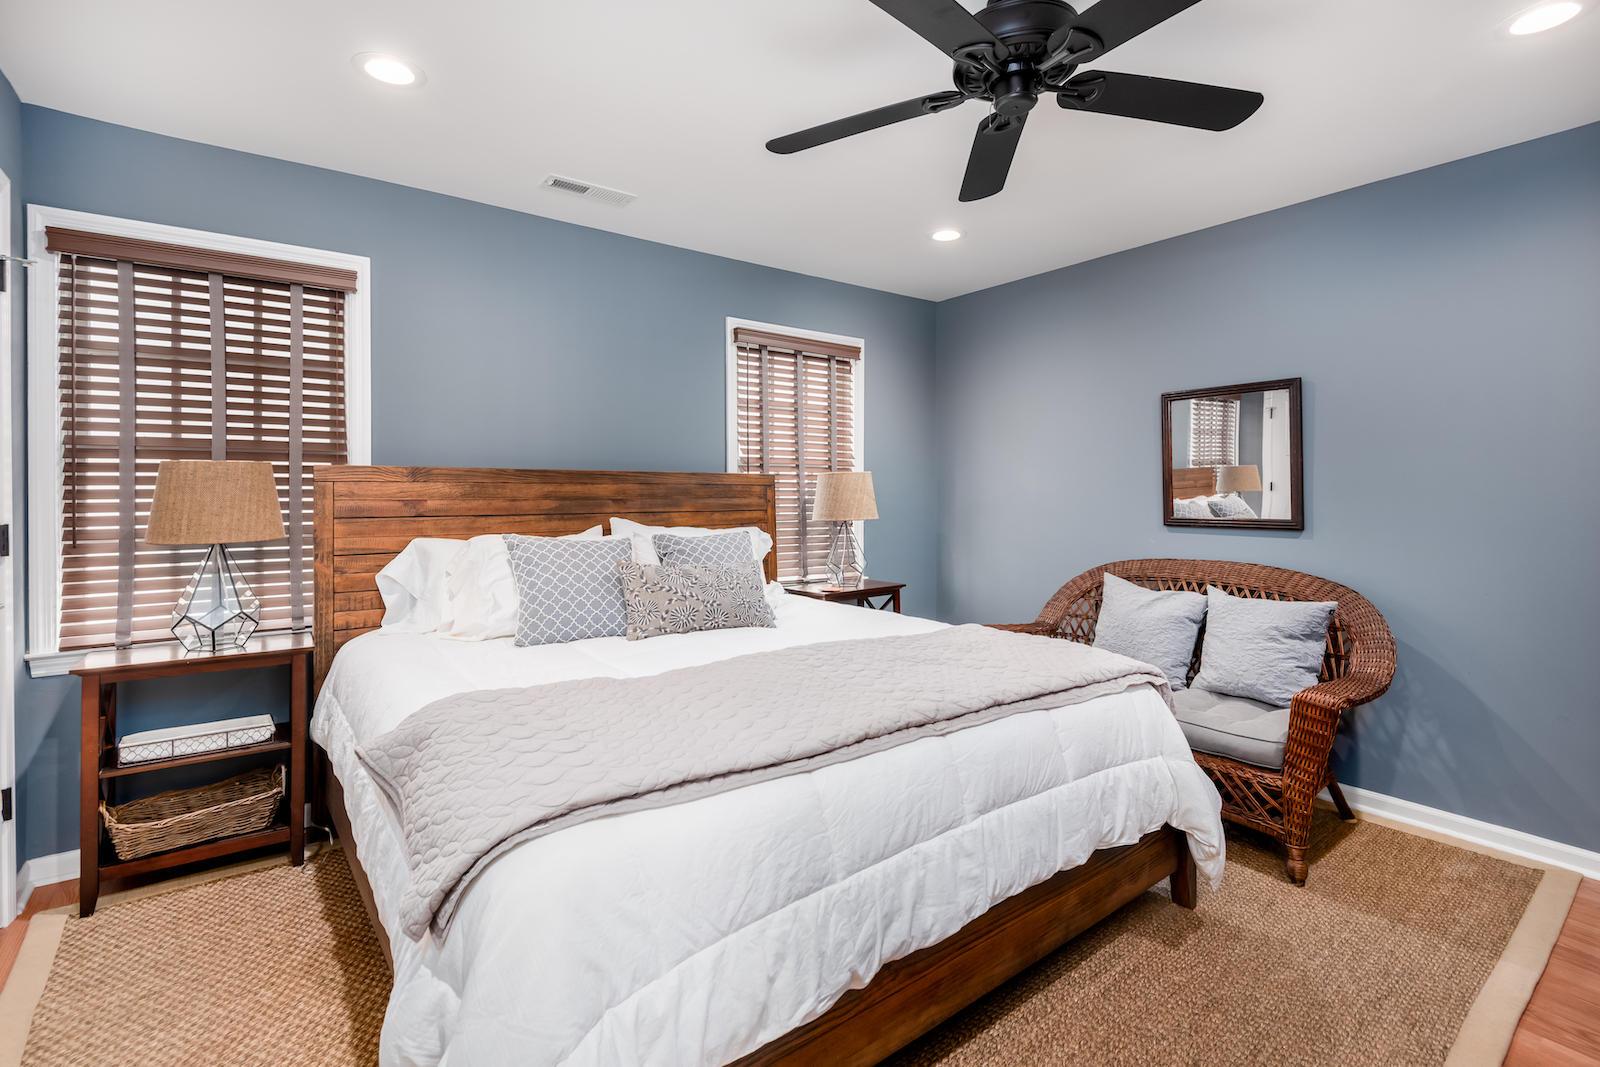 Harleston Village Homes For Sale - 15 Horlbeck, Charleston, SC - 25